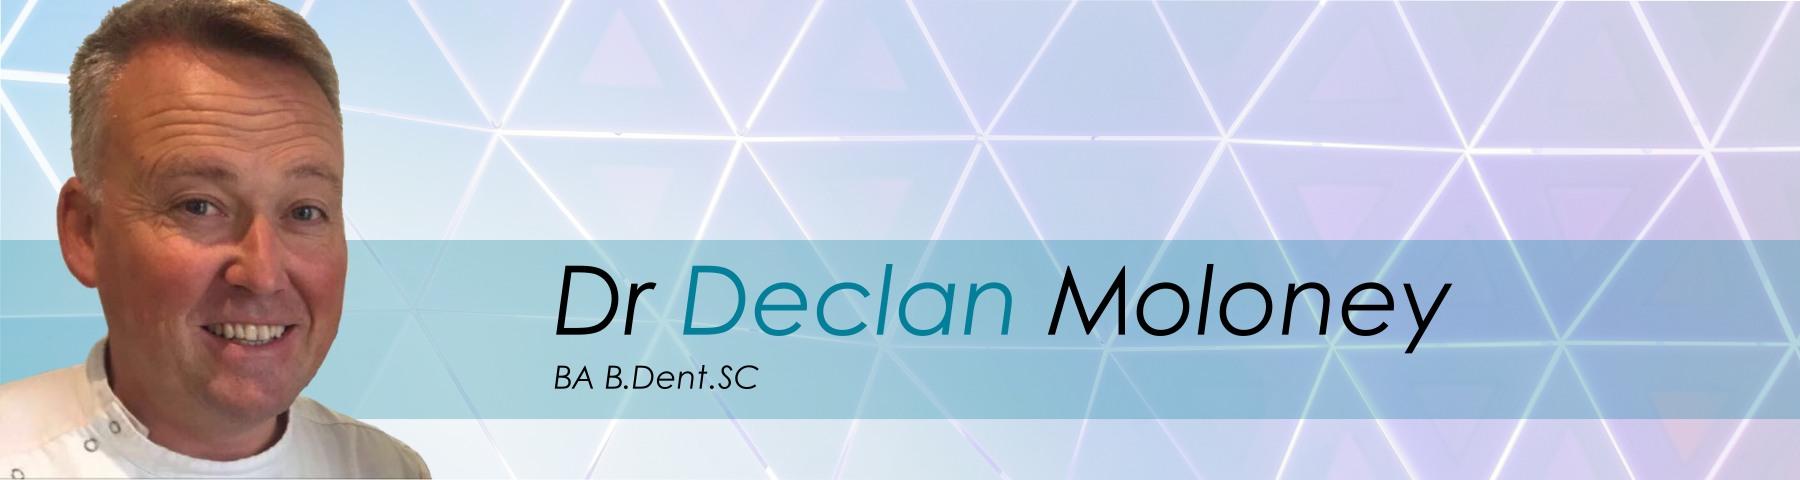 Dr Declan Moloney BA B Dent SC